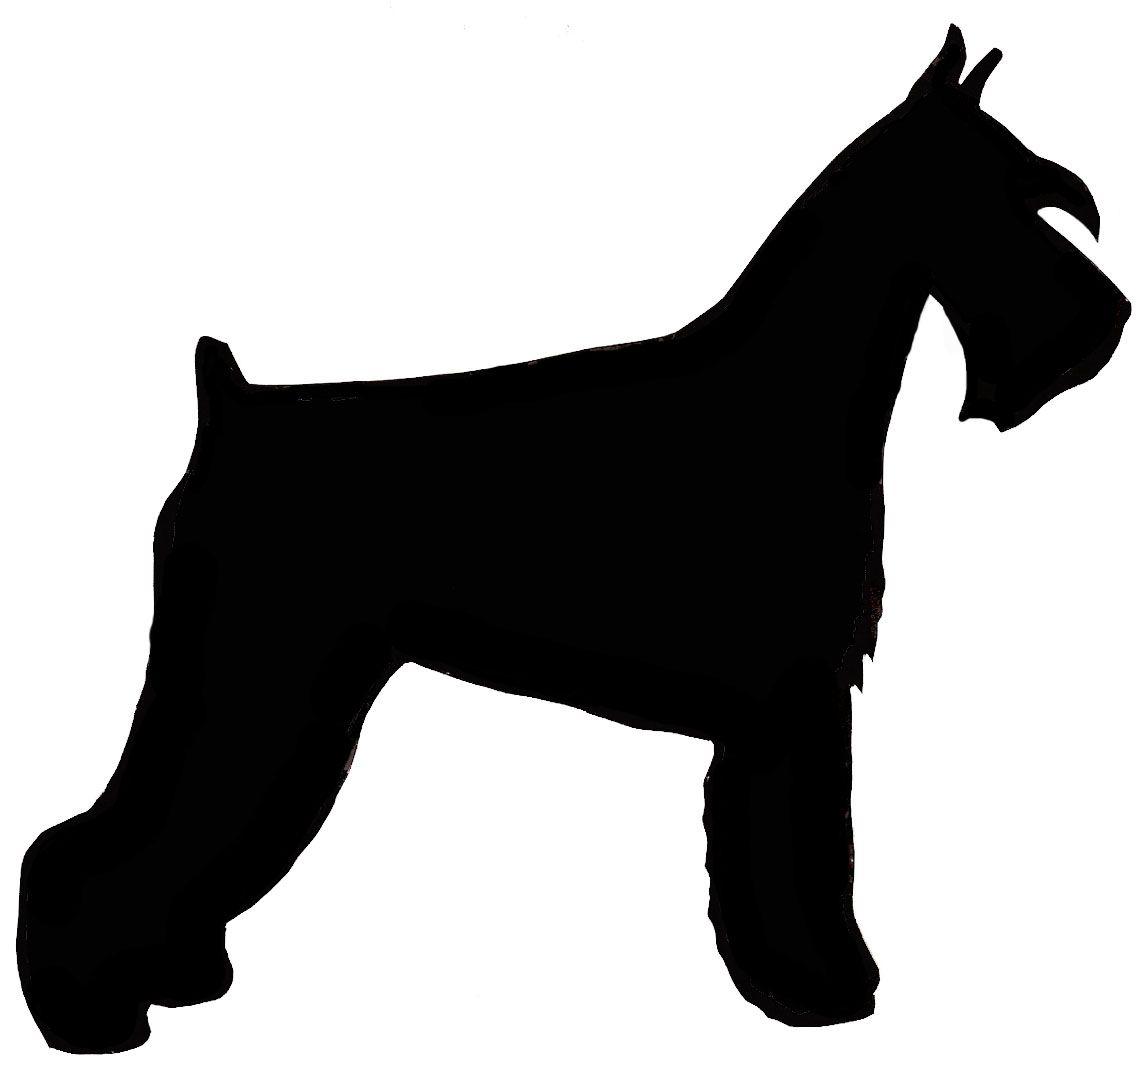 Scottish terrier yorkshire schnauzers. Beagle clipart schnauzer